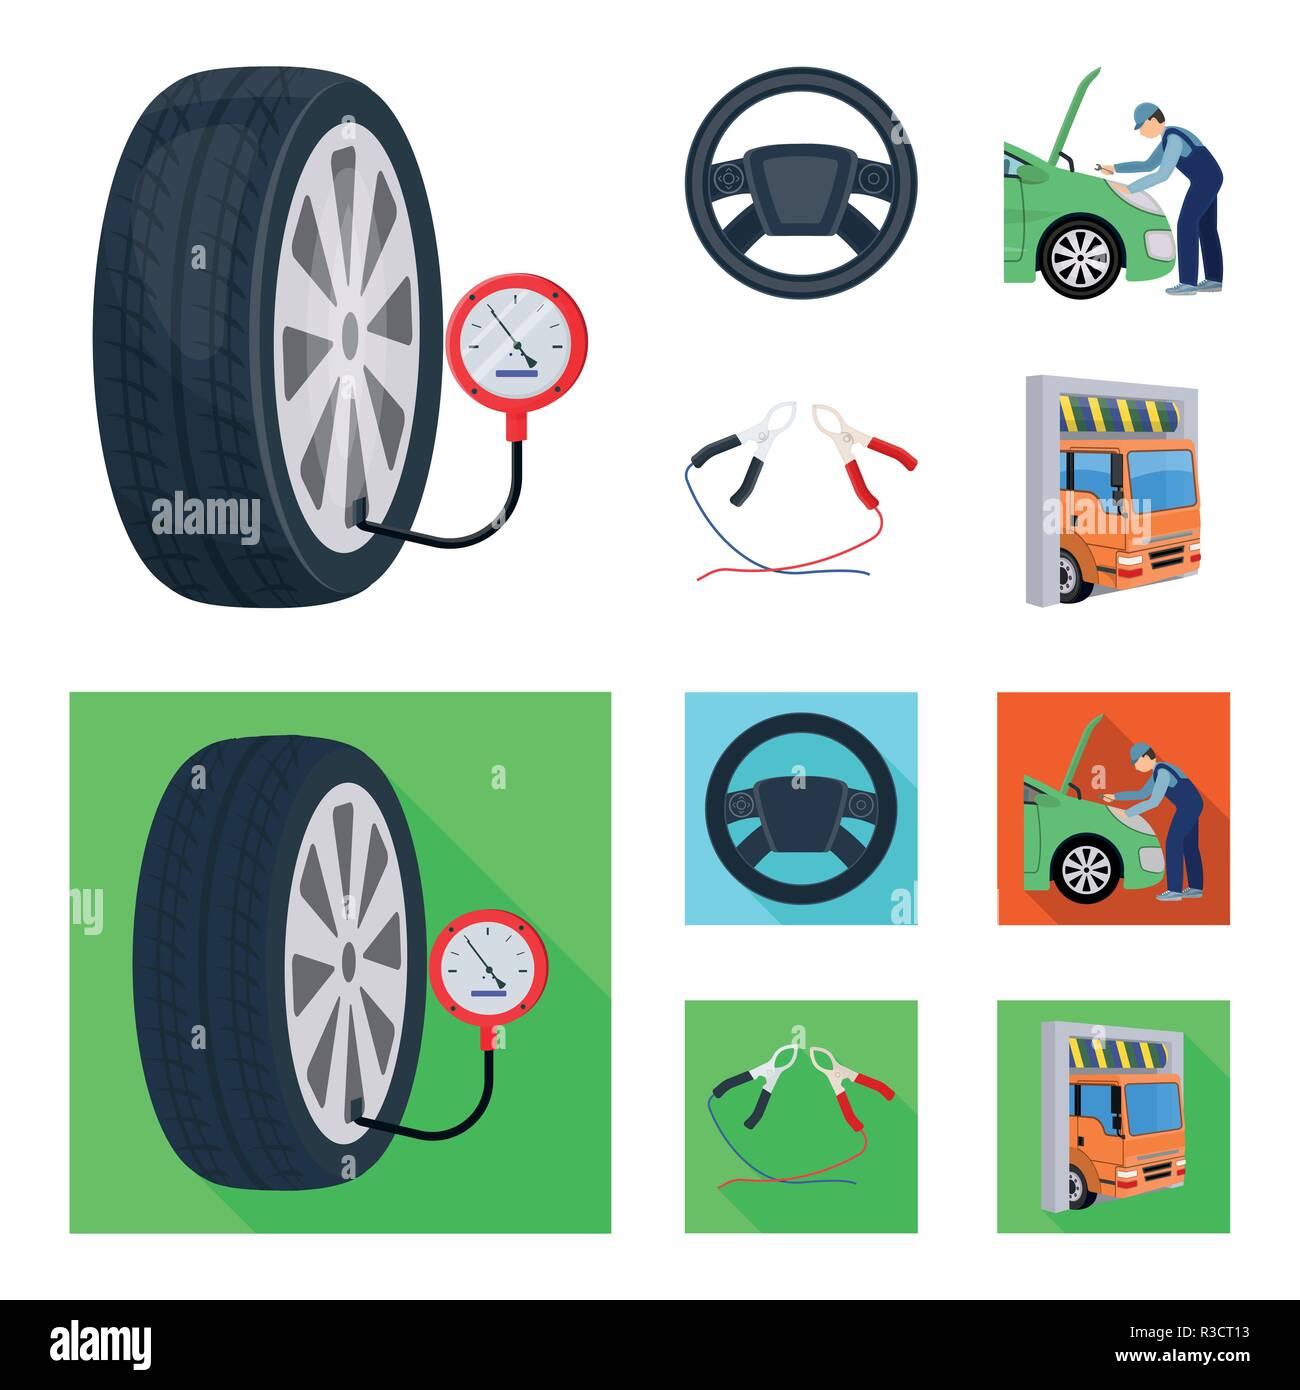 engine adjustment steering wheel clamp and wheel cartoon flat